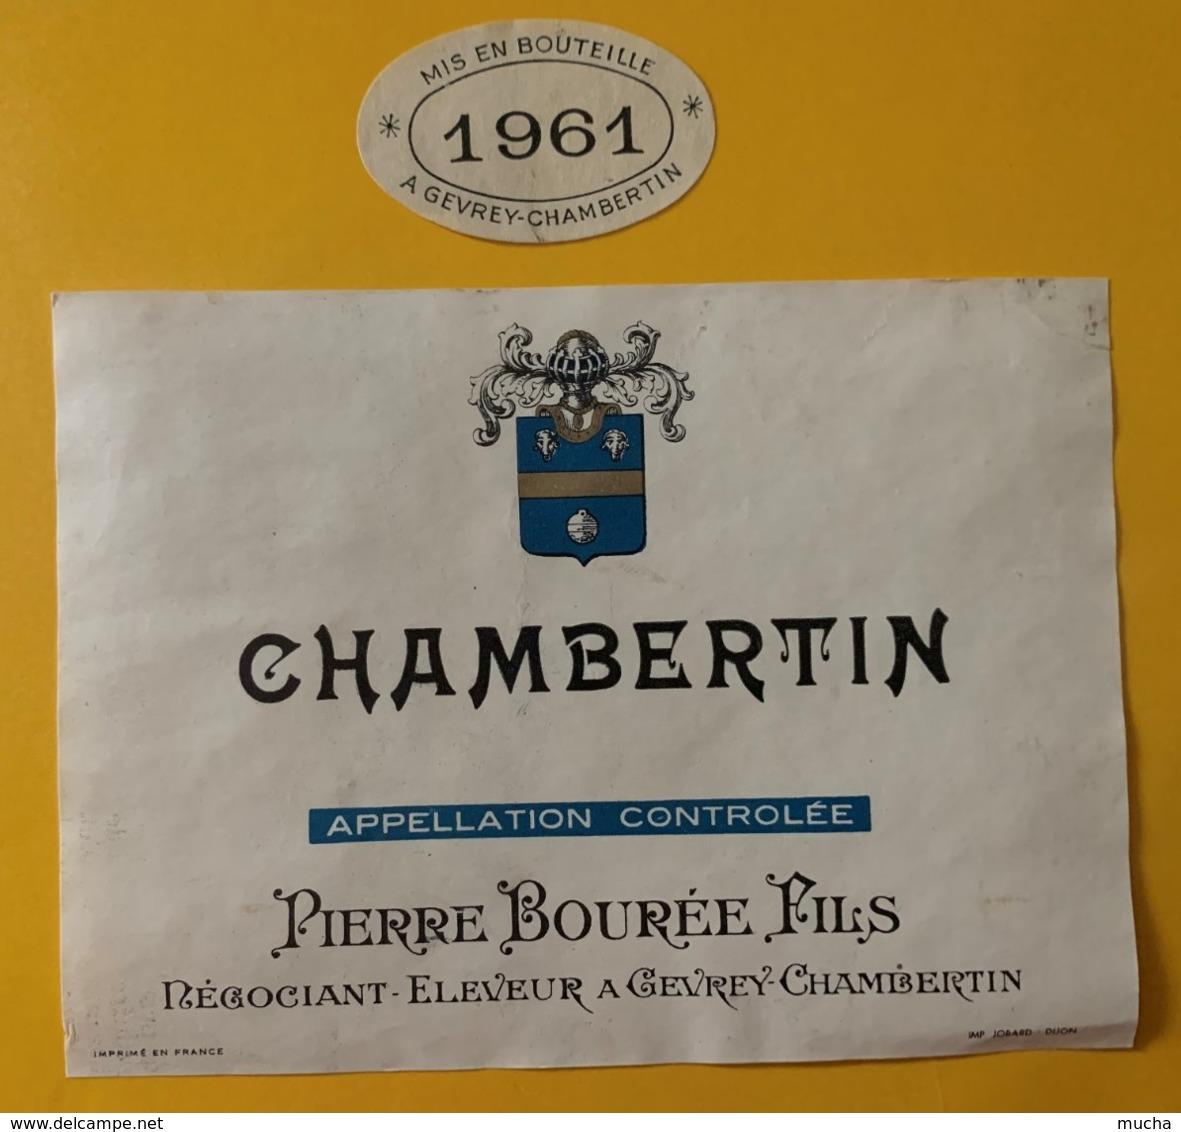 12112 - Chambertin 1961 Pierre Bourée - Bourgogne